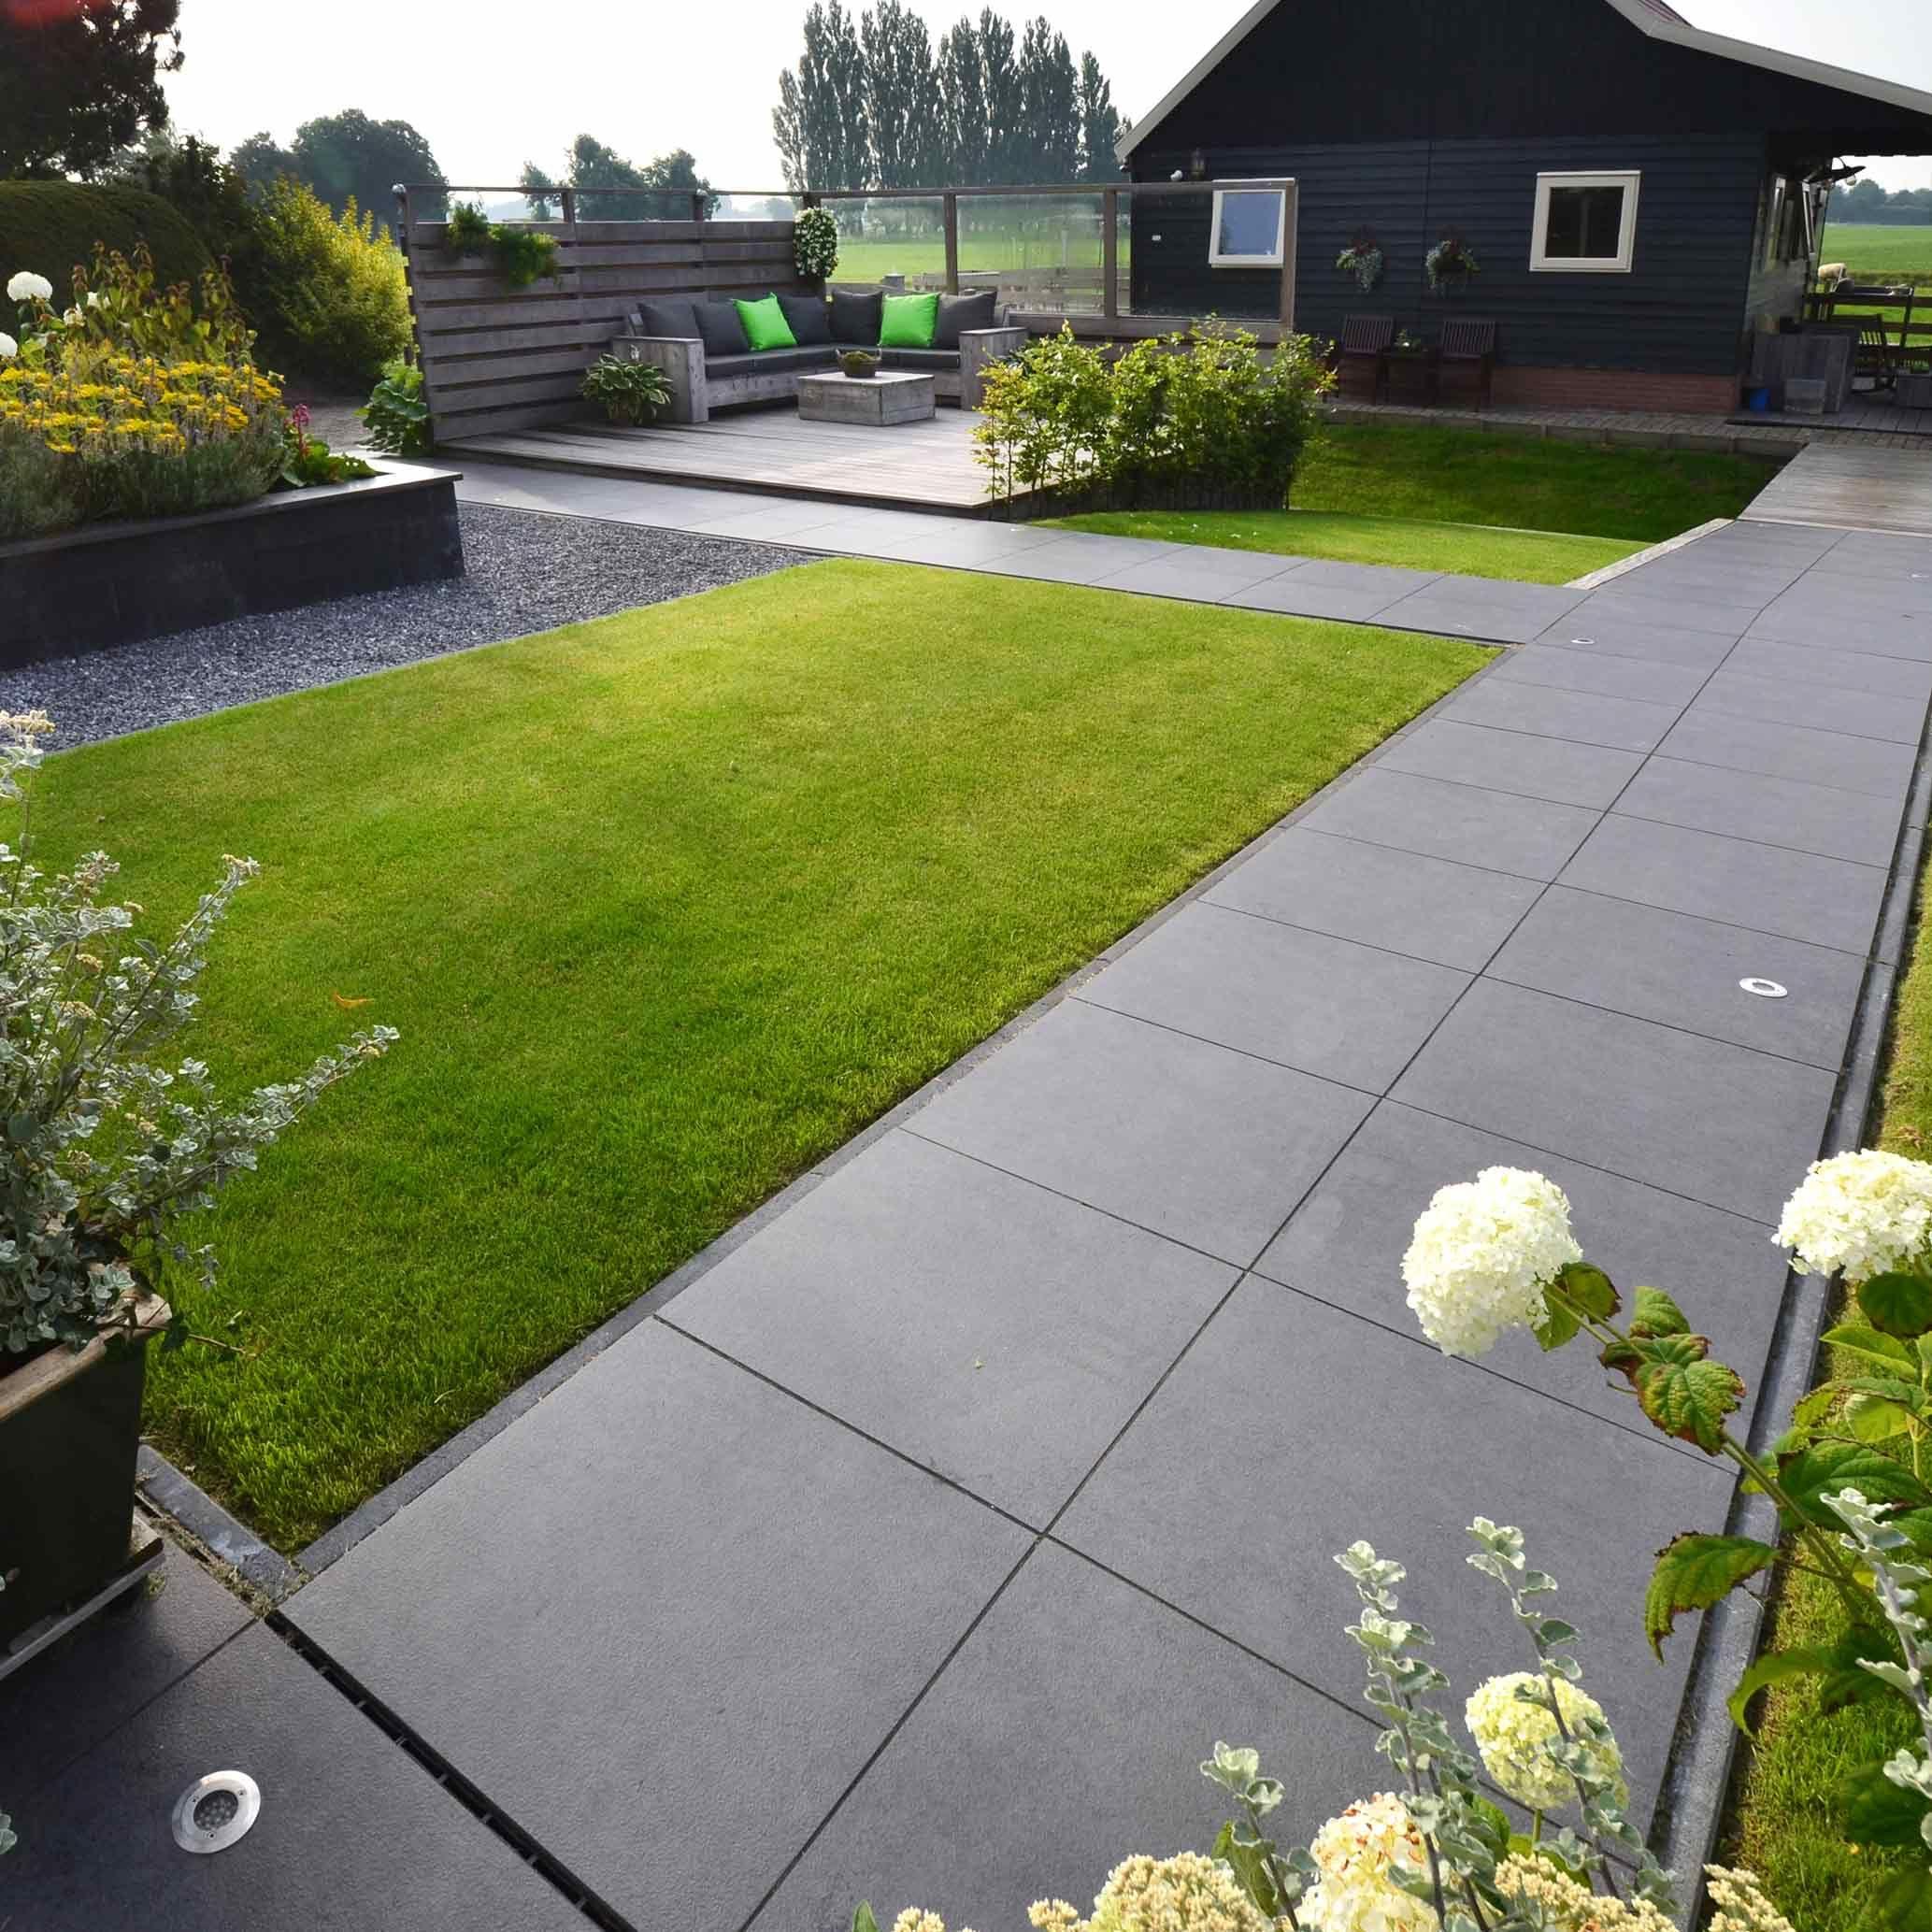 Grijze Grote Tuintegels.Moderne Tuin Met Grote Grijze Tegels Blagoustrojstva Tuin